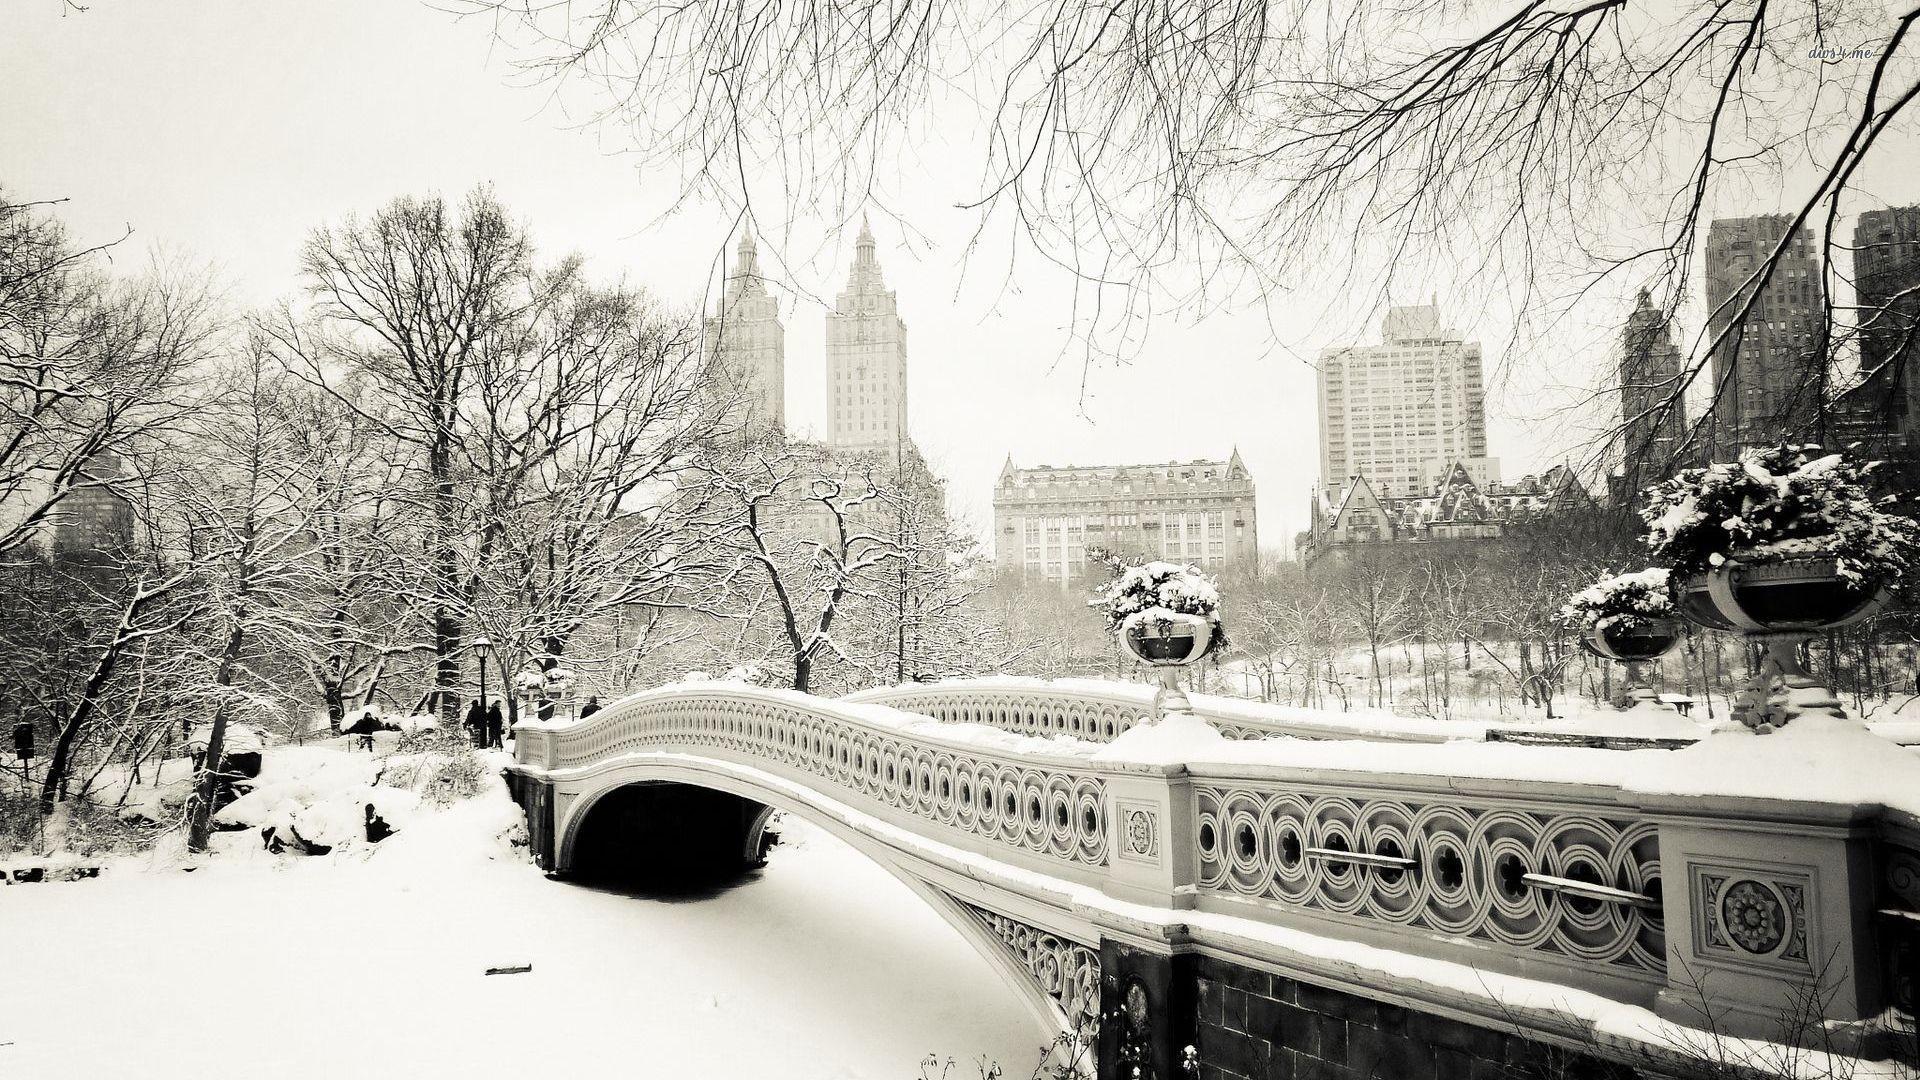 New York City Winter Wallpaper 62 images 1920x1080